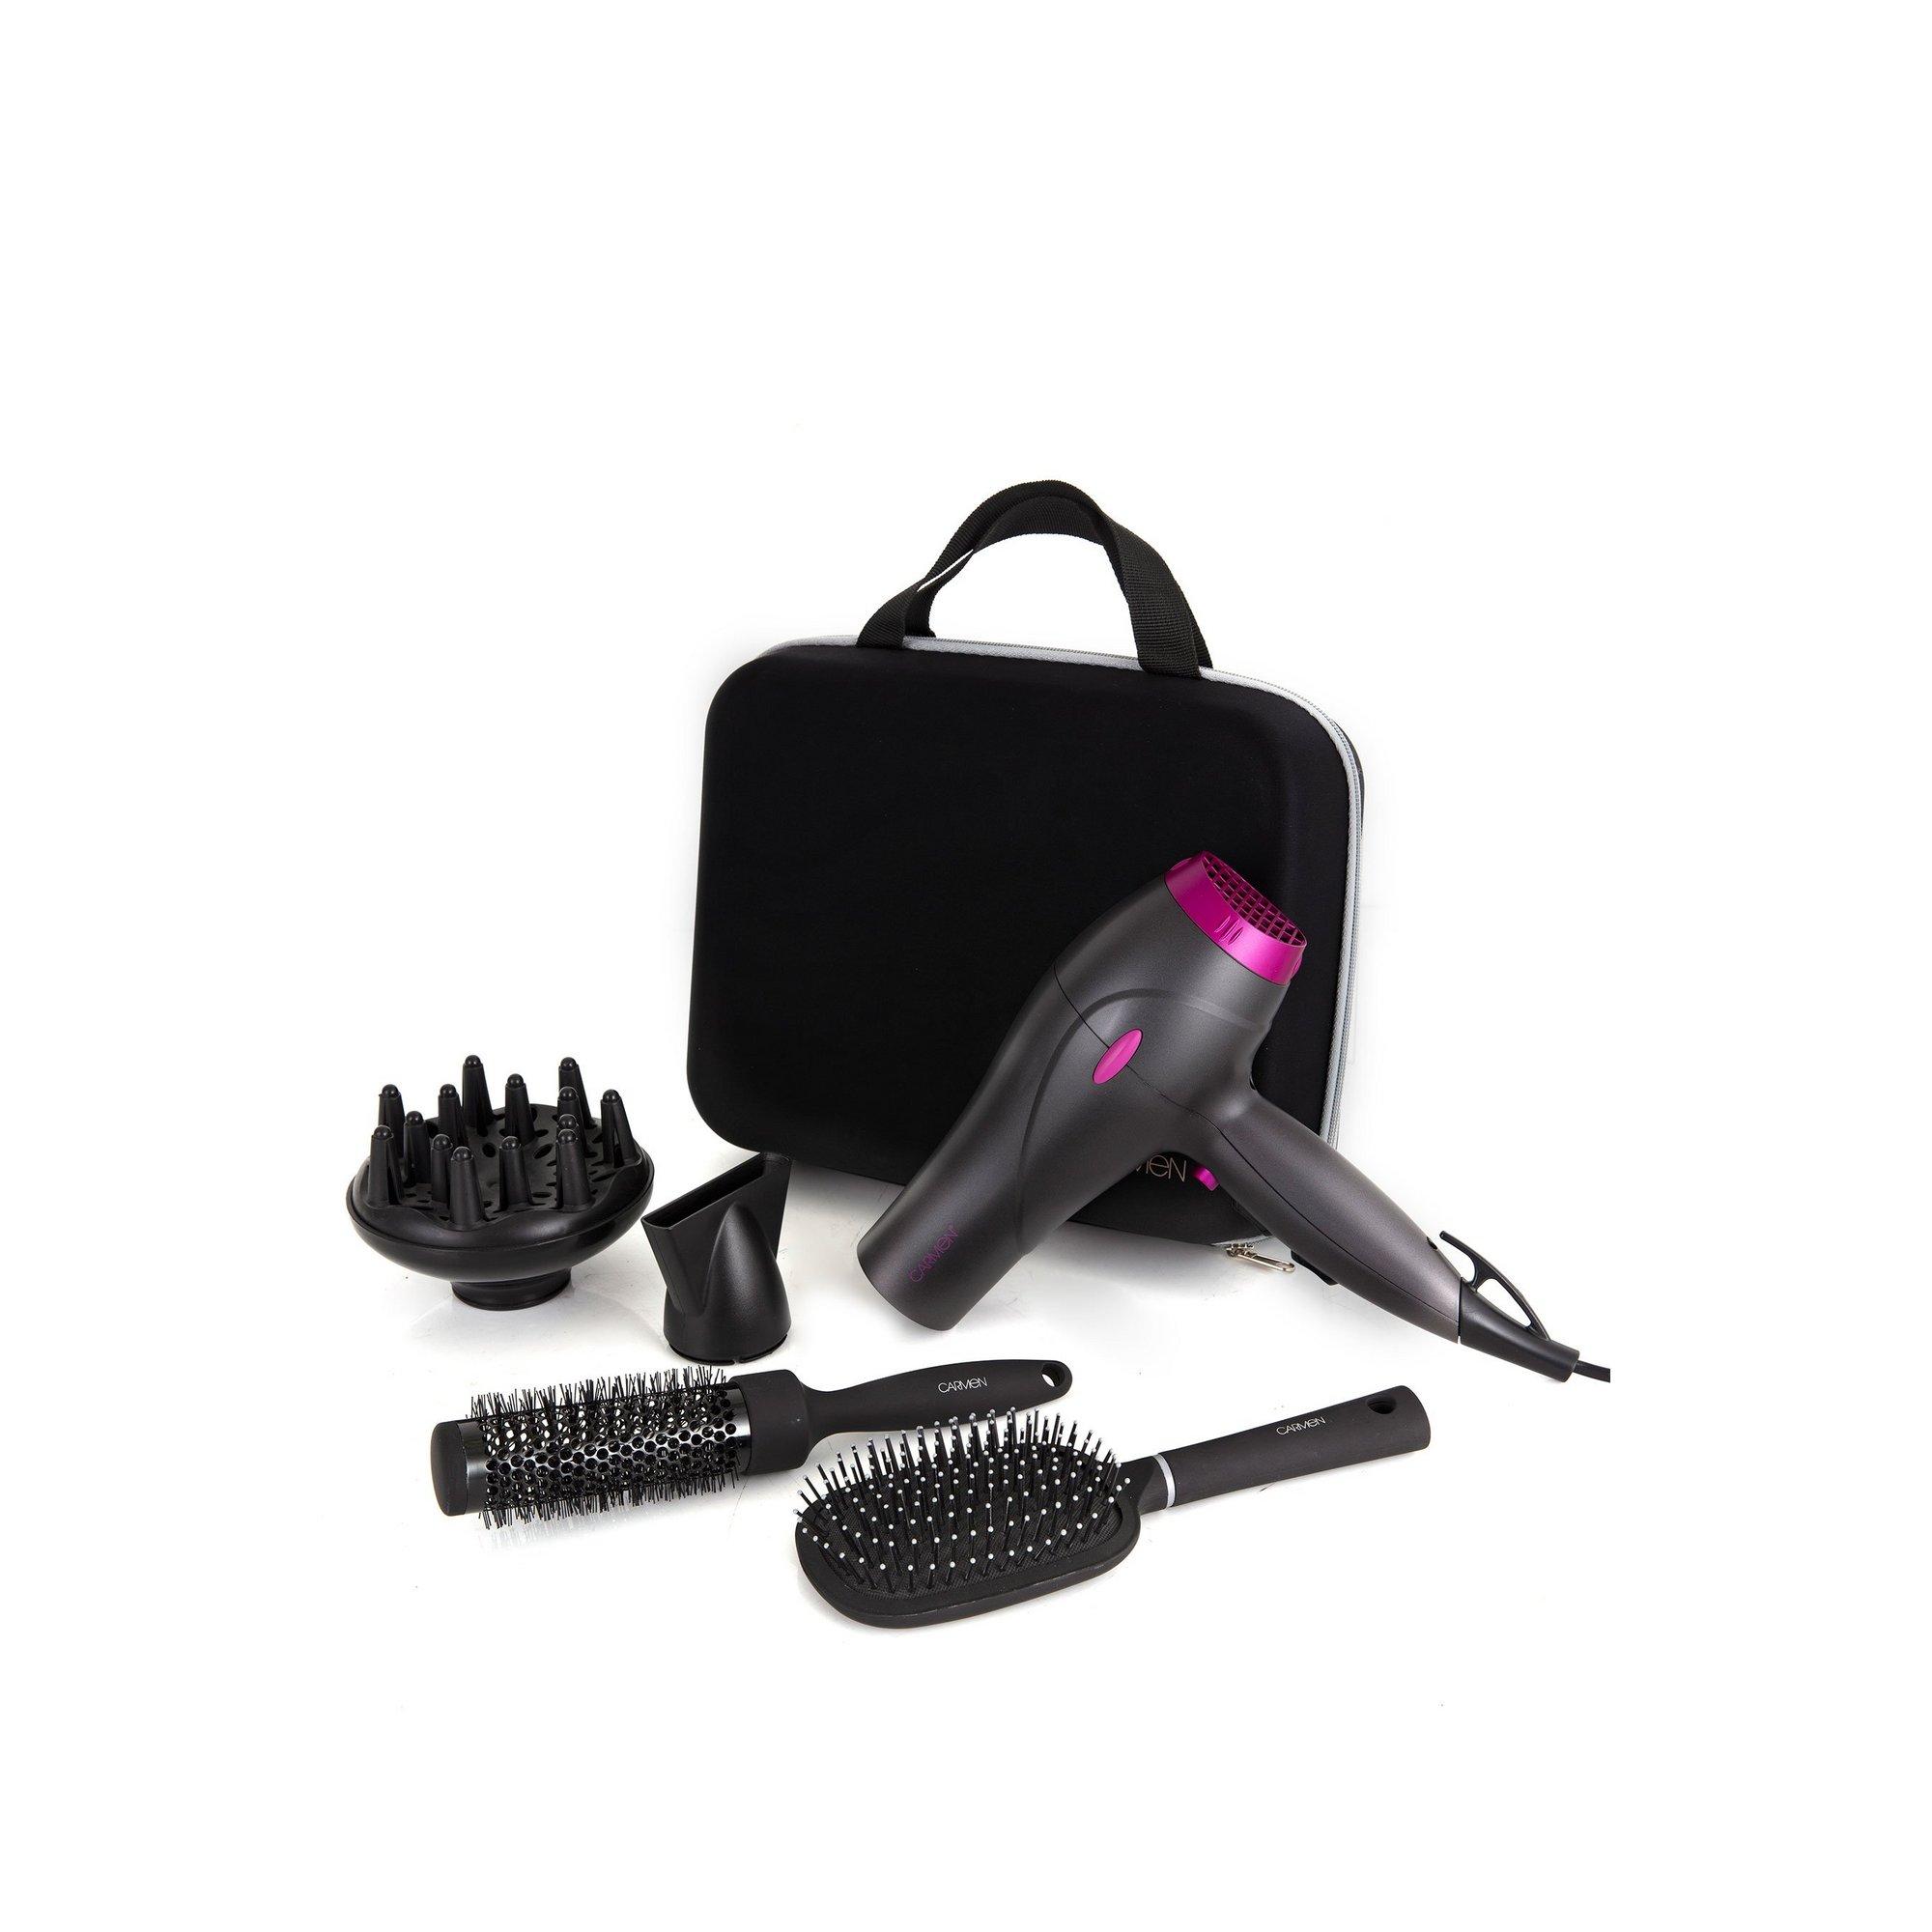 Image of Carmen Neon 2200W Hair Dryer Set